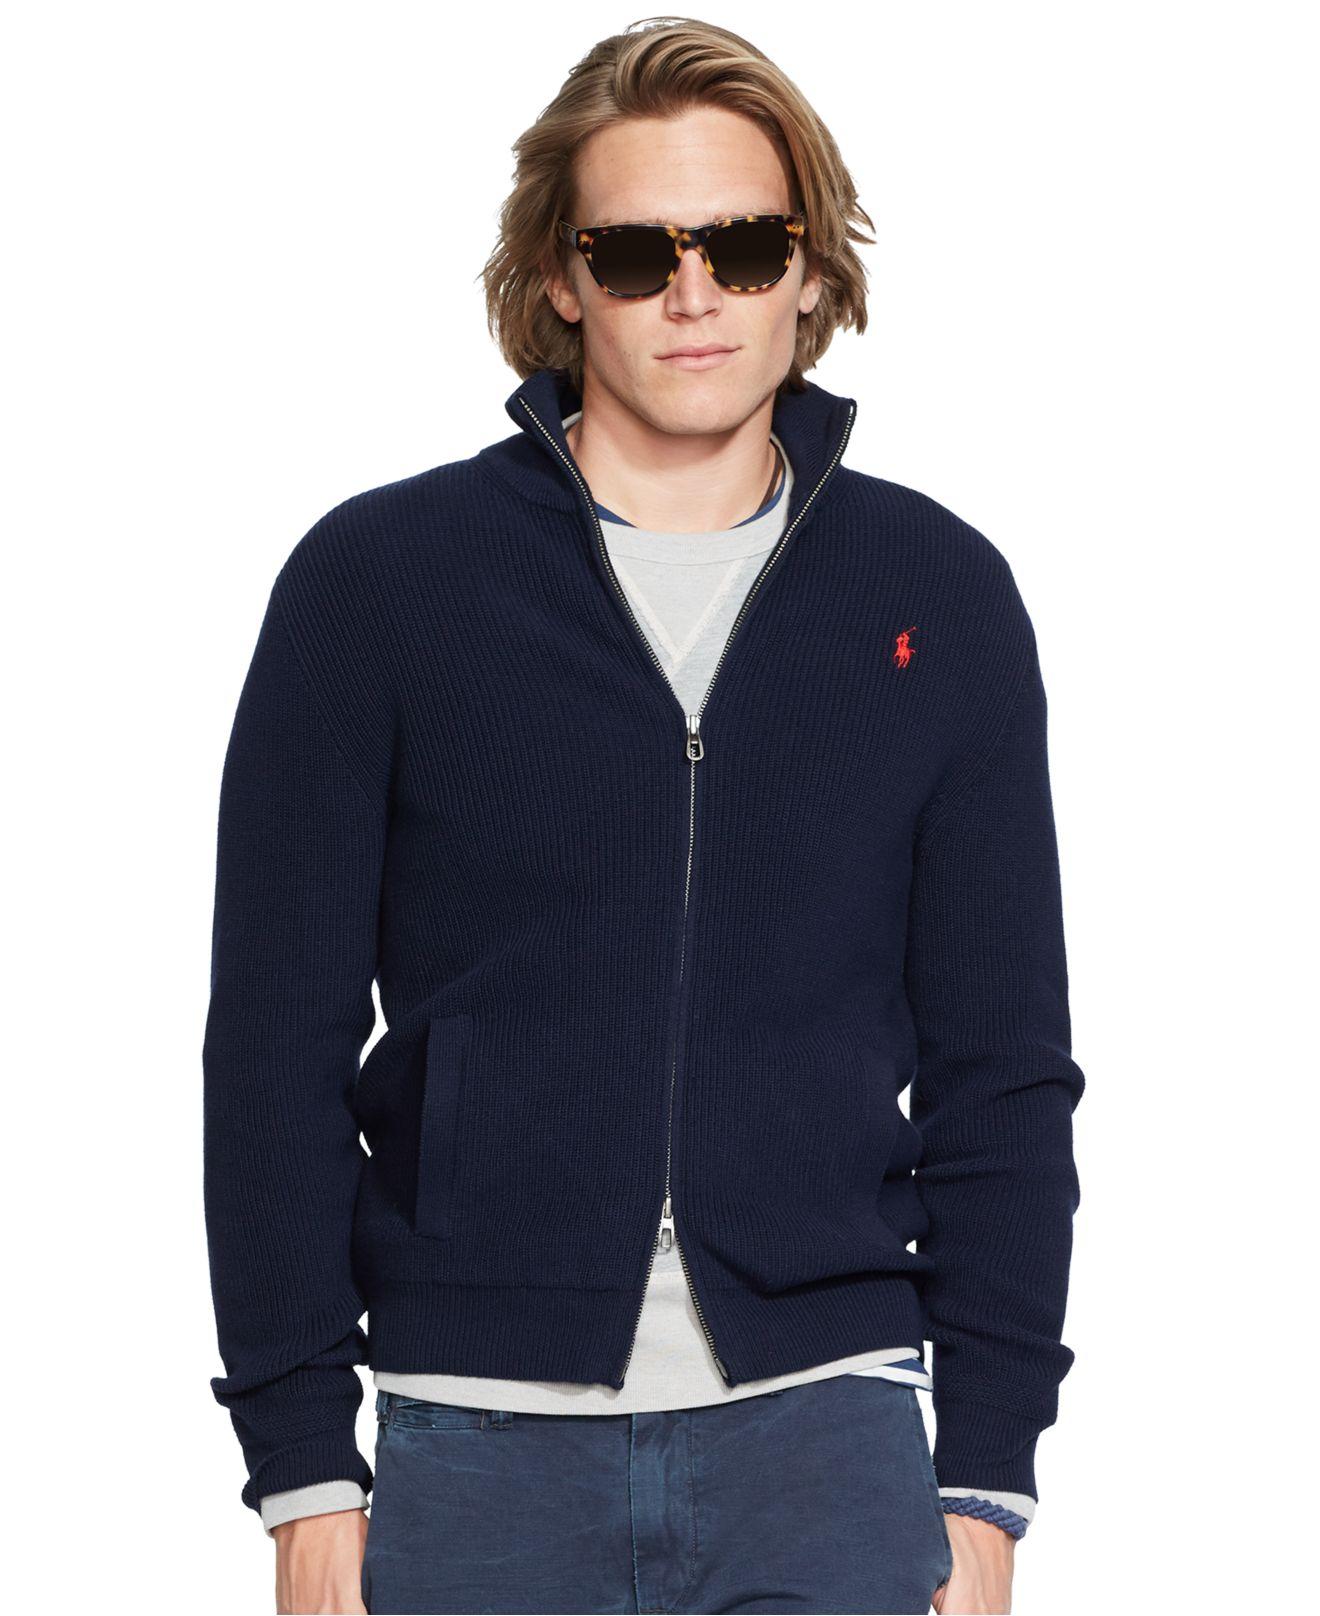 4c2e9d01f ... coupon lyst polo ralph lauren lightweight full zip sweater in blue for  men 572d0 c9009